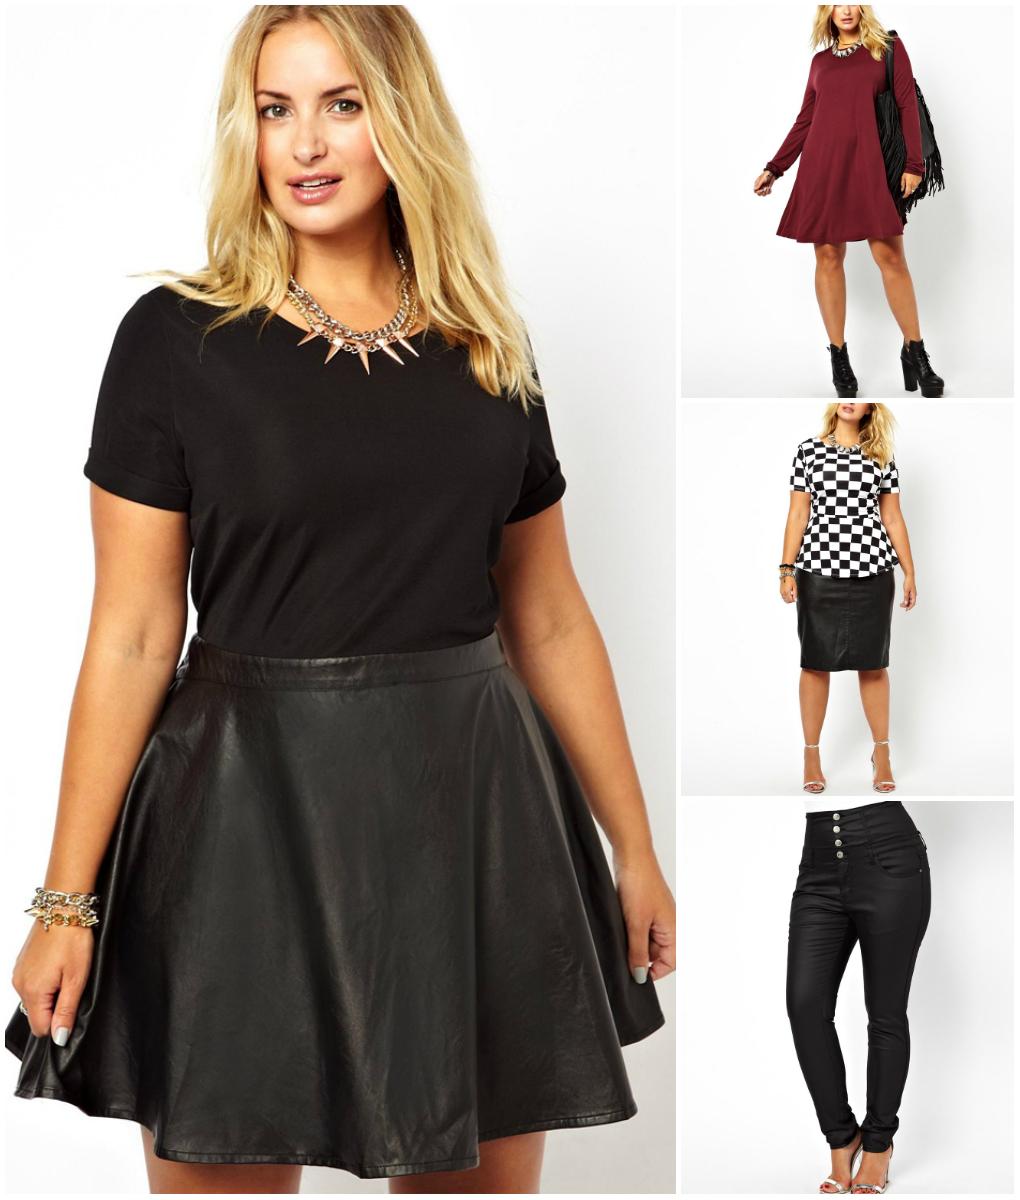 Black faux leather lace skater dress